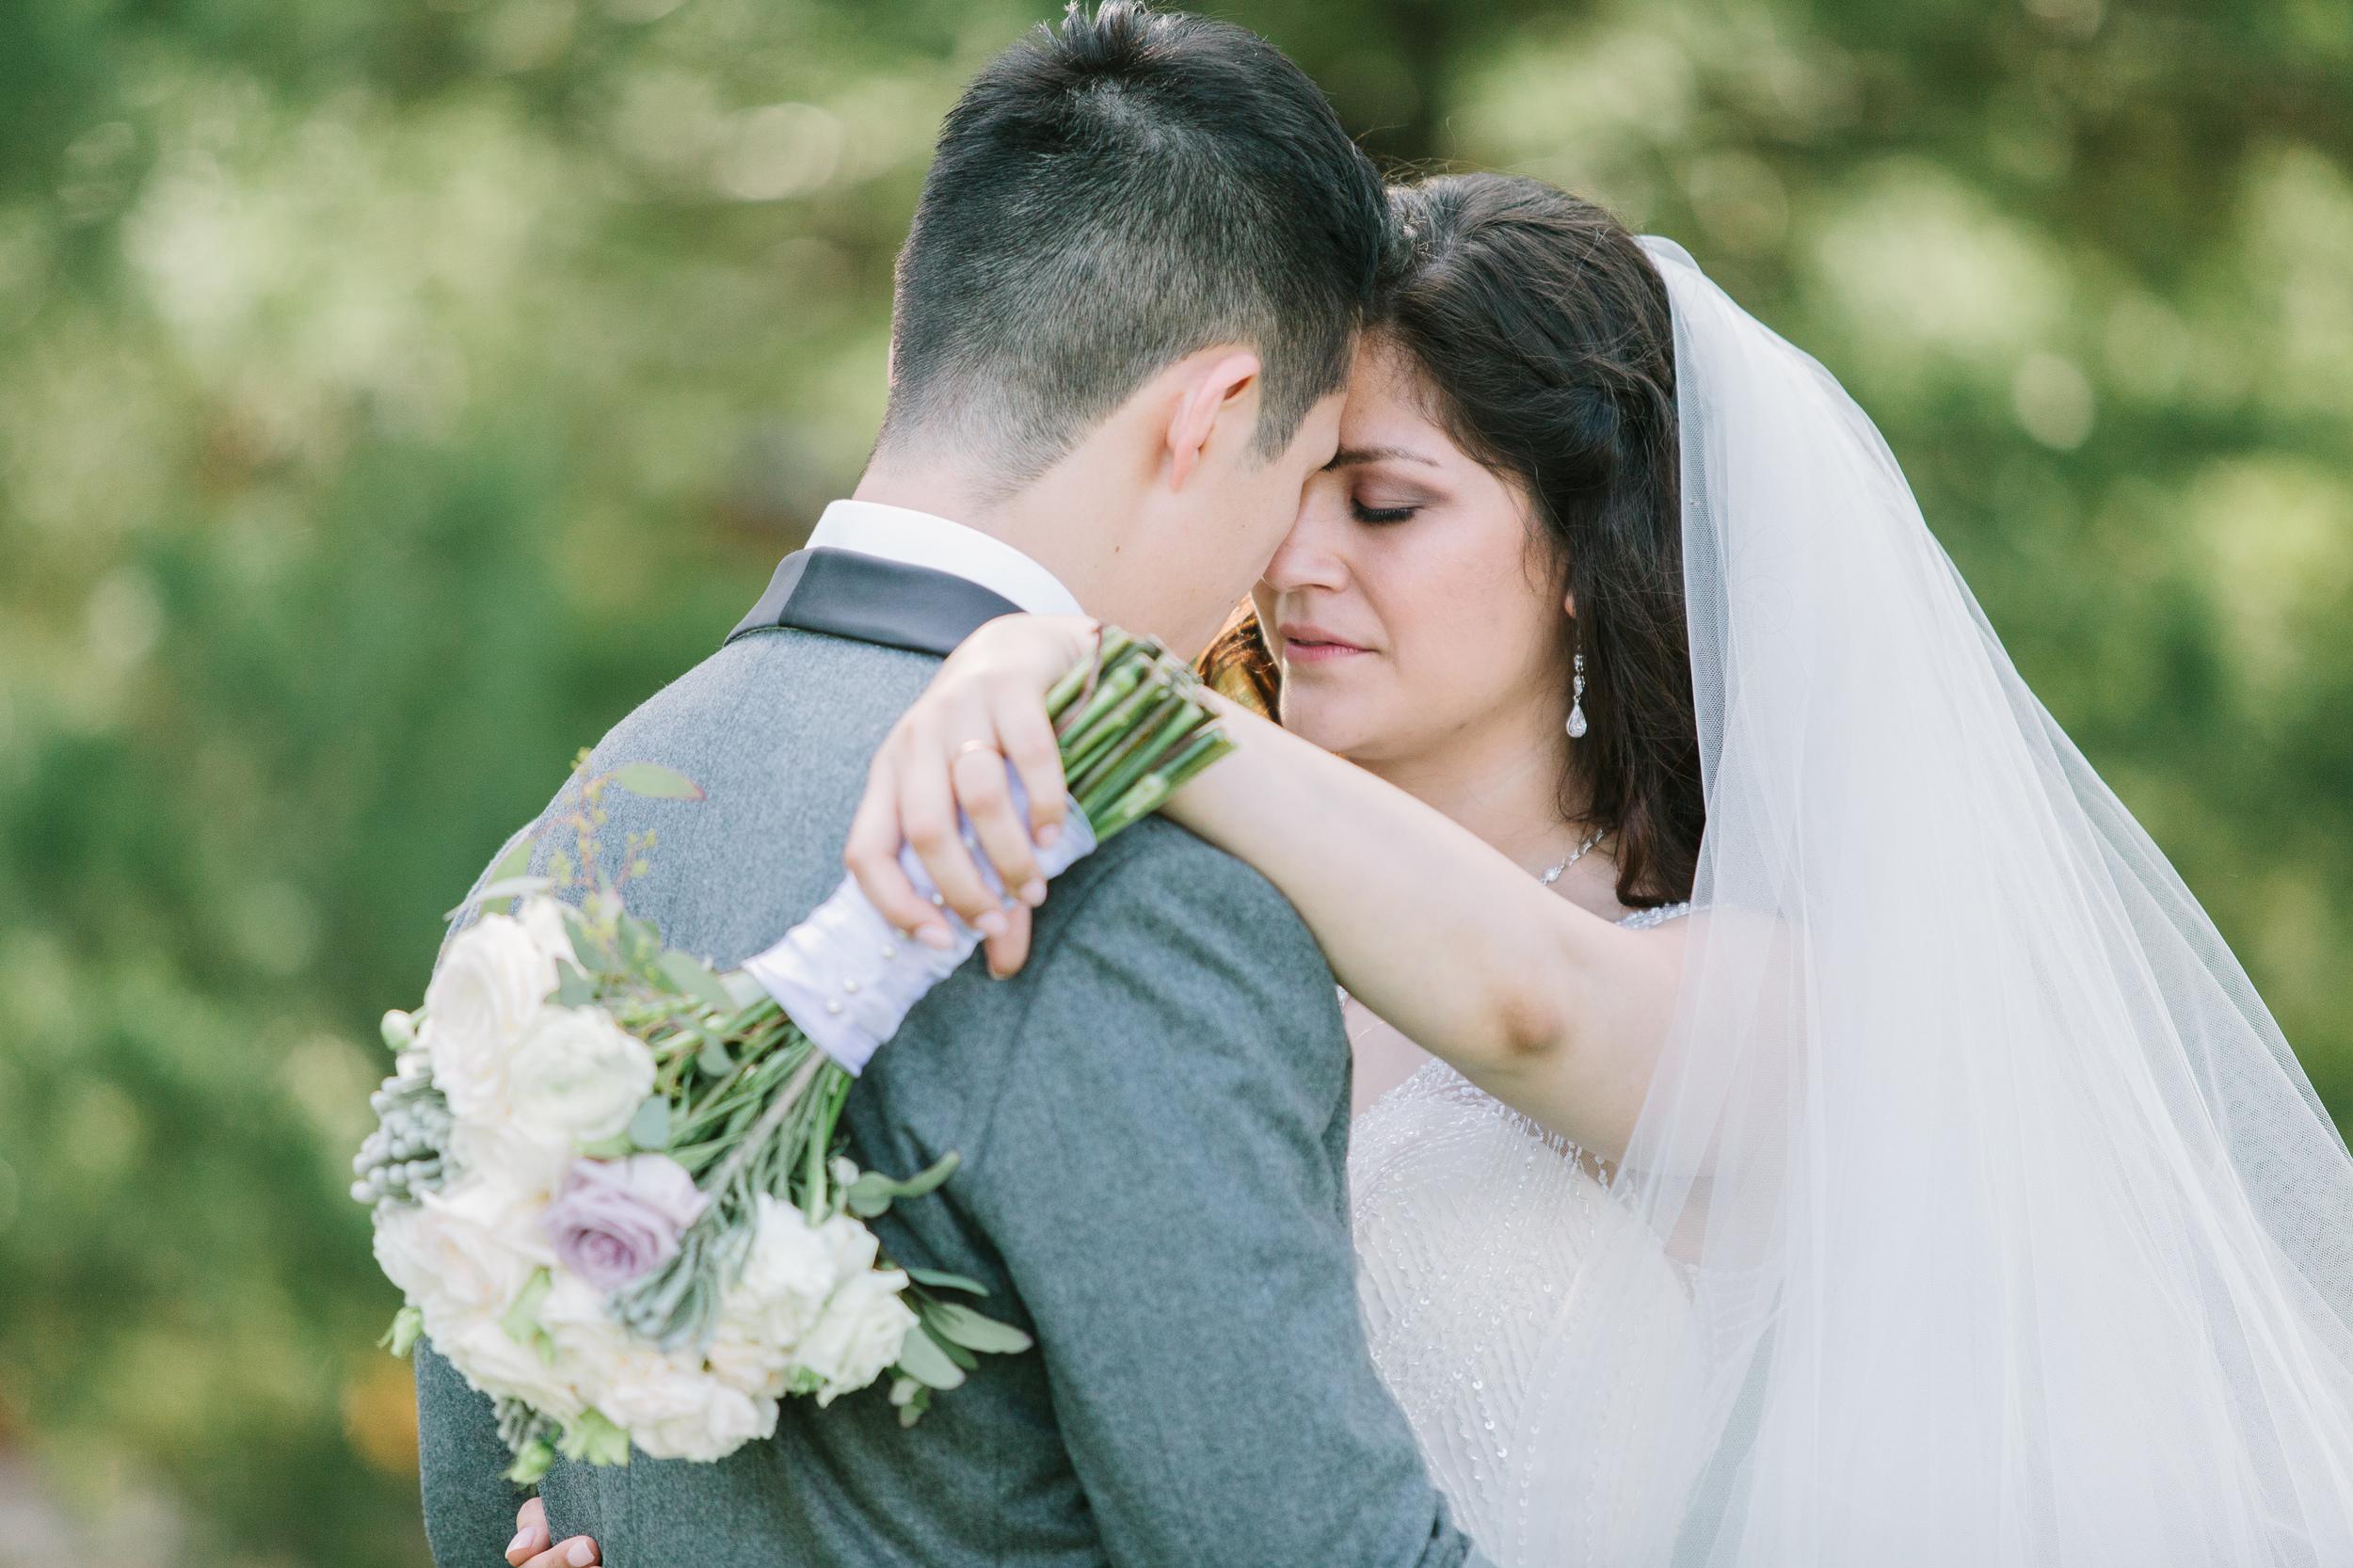 Nicodem Creative_Blog_Leung Wedding_The Pavilion at Orchad Ridge Farms_Rockton Illinois-55.jpg